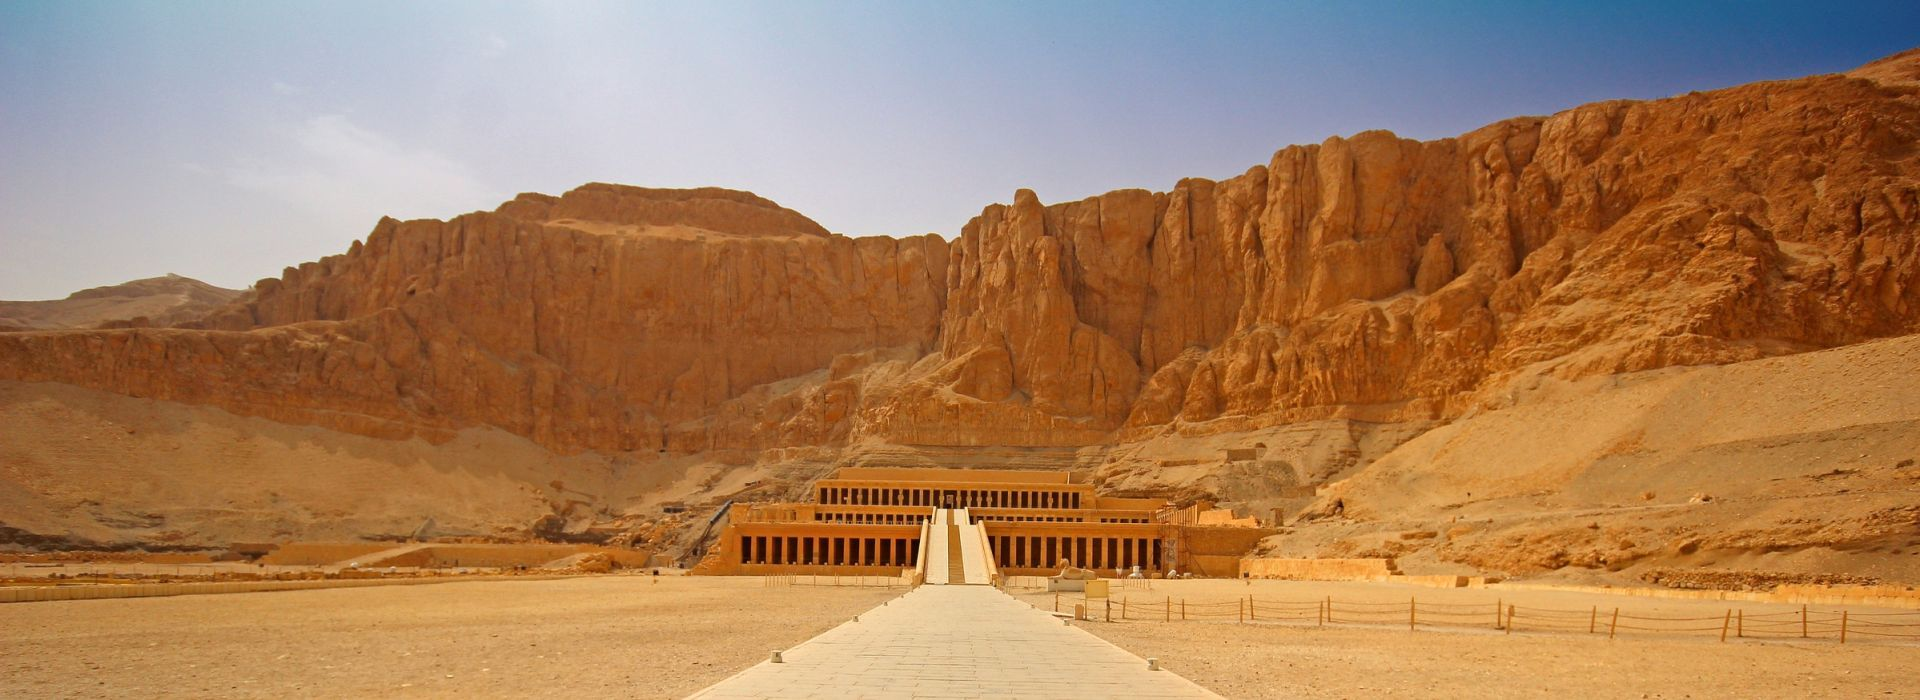 Natural landmarks sightseeing Tours in Egypt